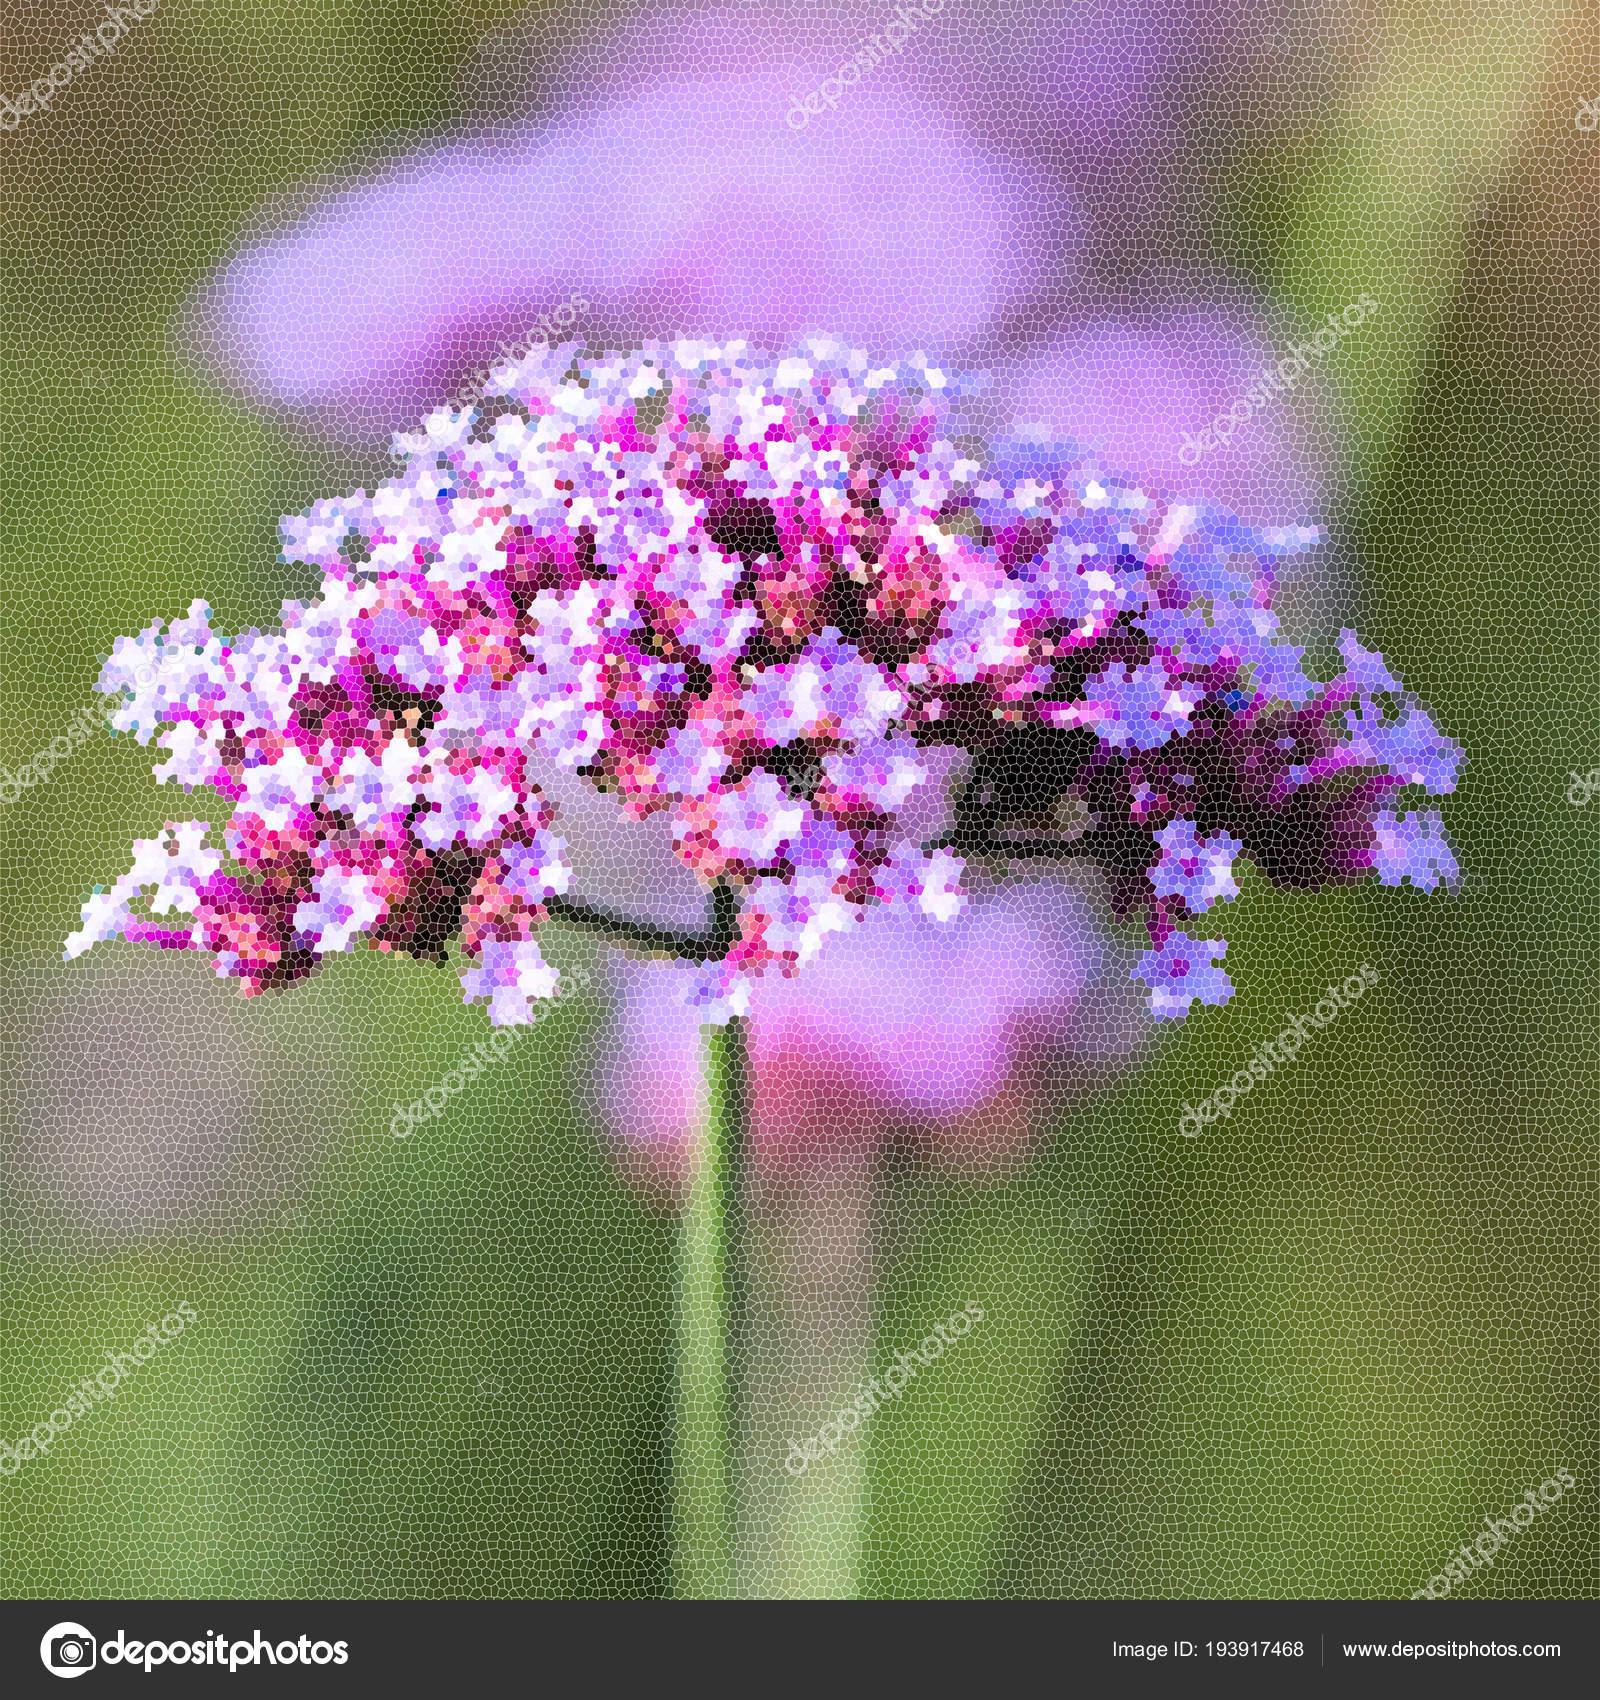 Primer Plano De Flores De Color Púrpura Vivo Imitación De Mosaico